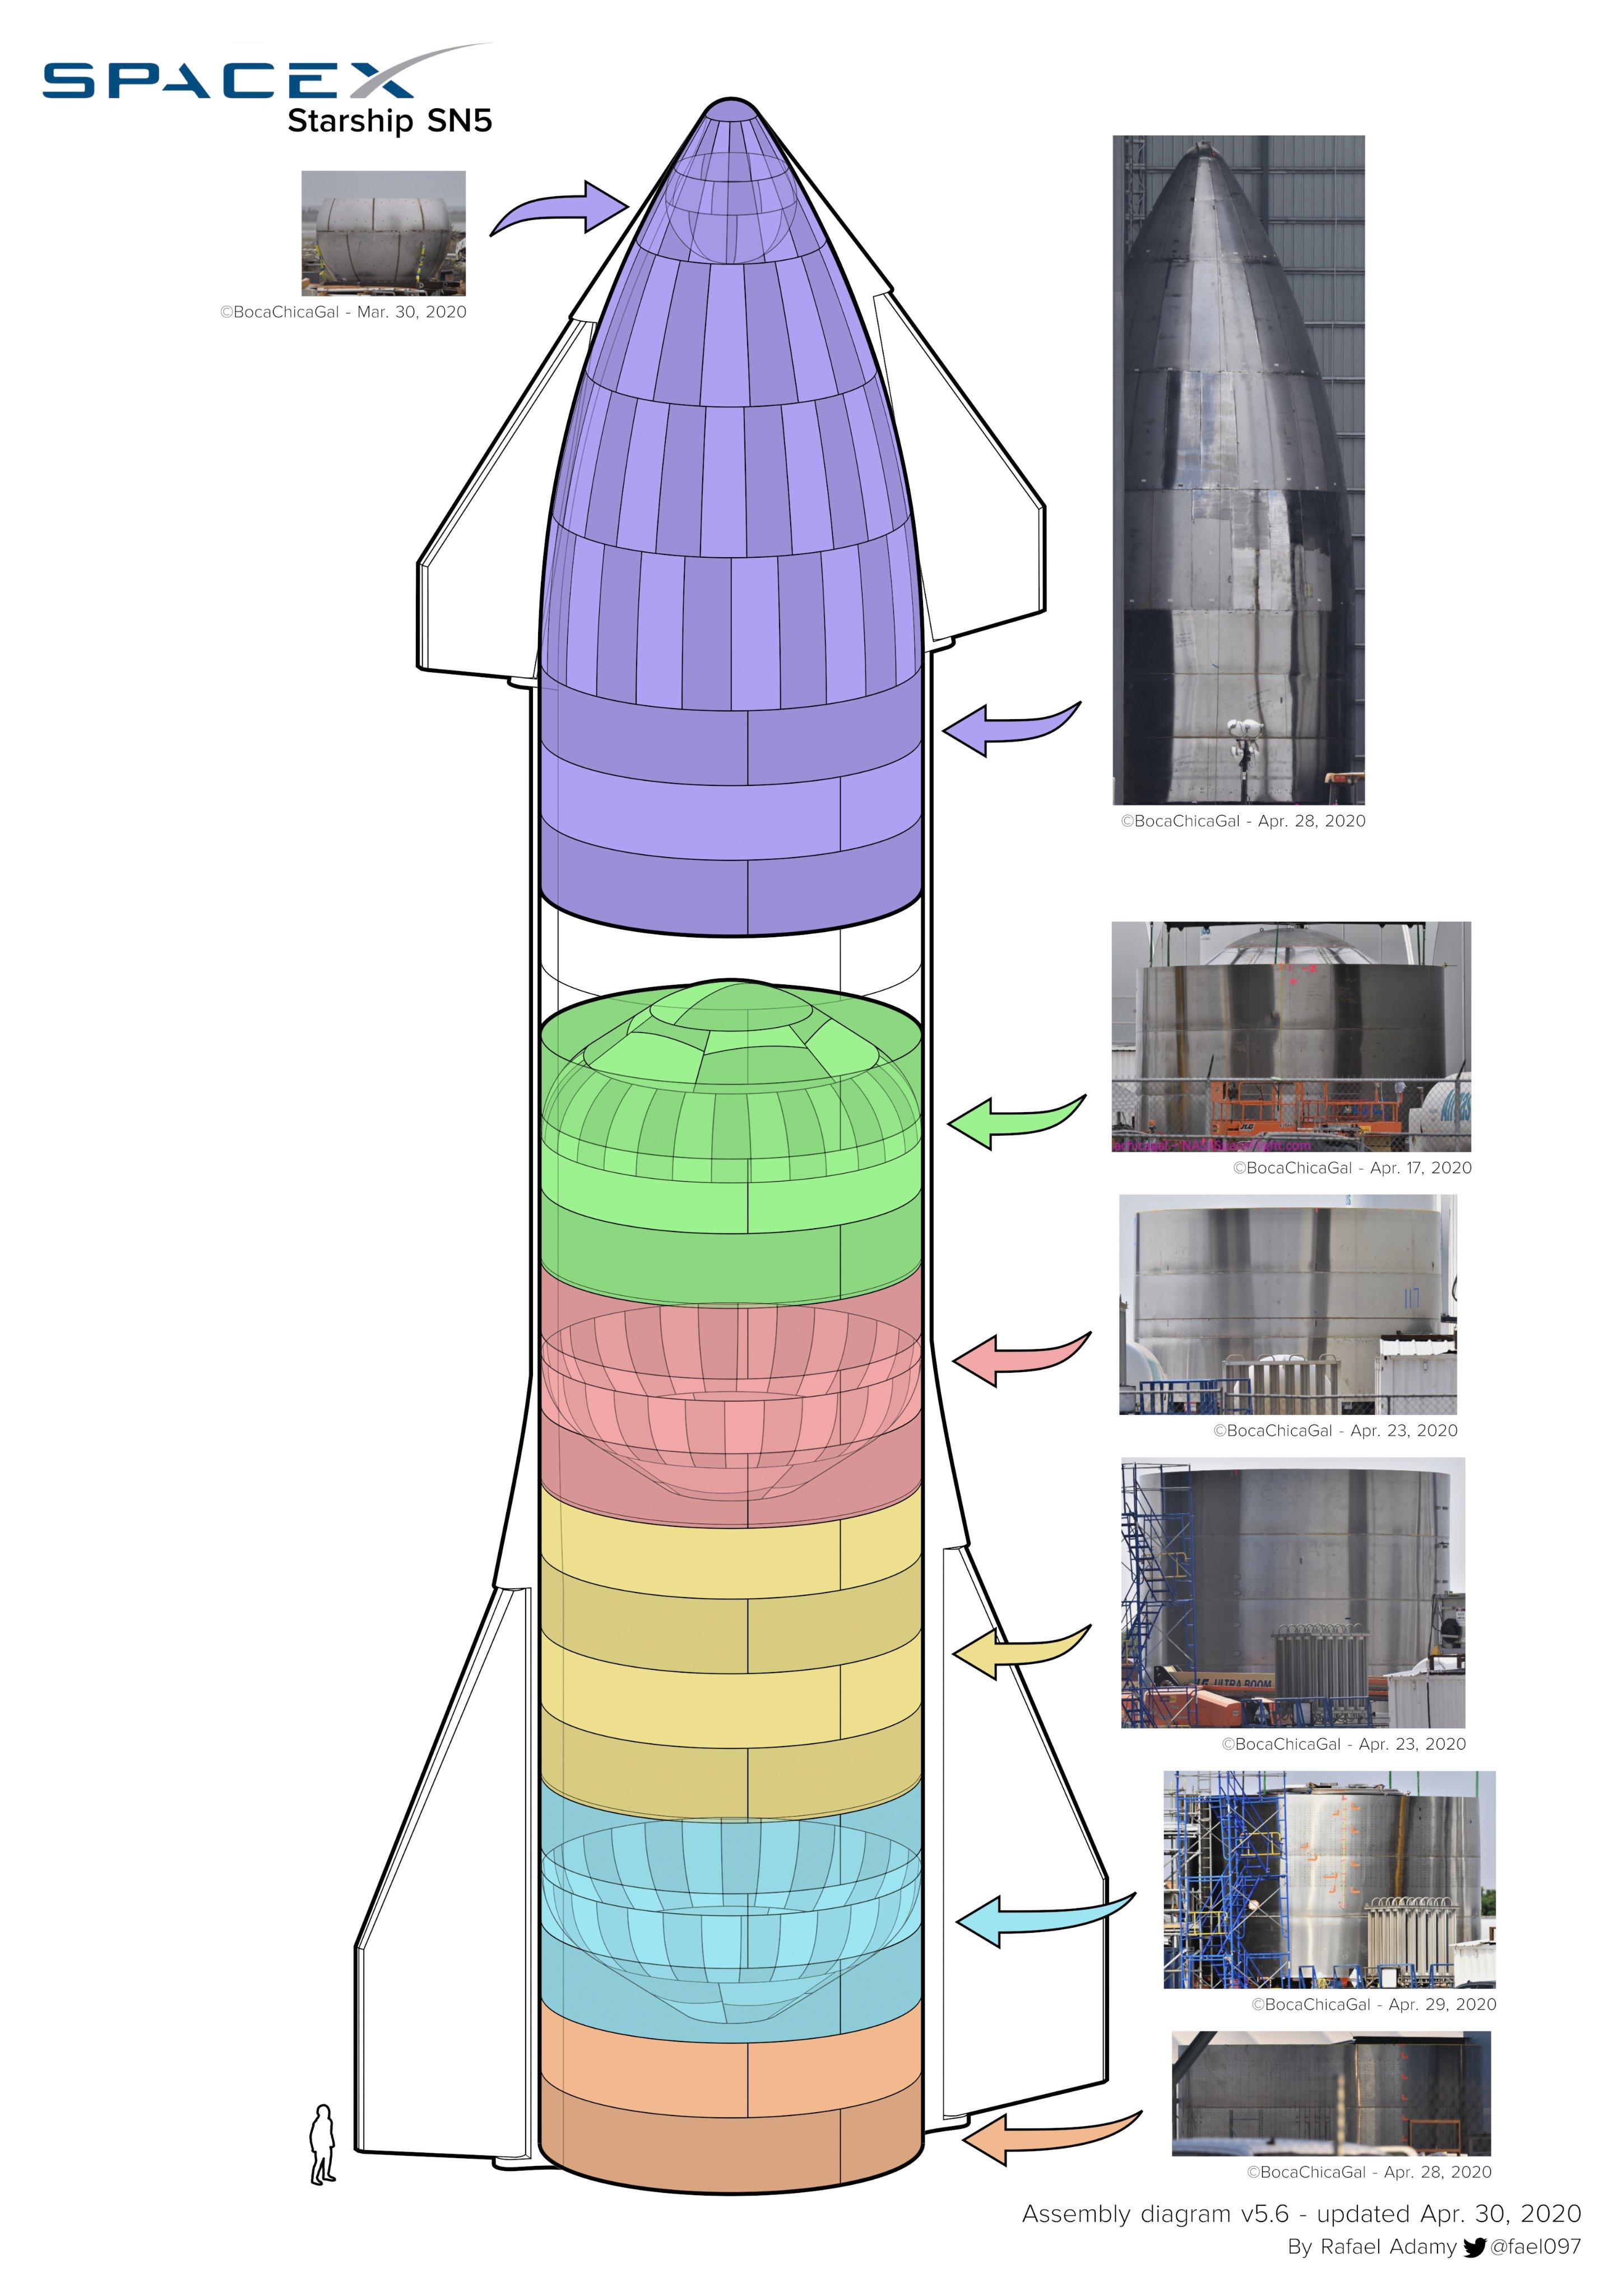 Starship SN5 (Boca Chica) - Page 3 EW07OXaXYAIp9Pj?format=jpg&name=4096x4096